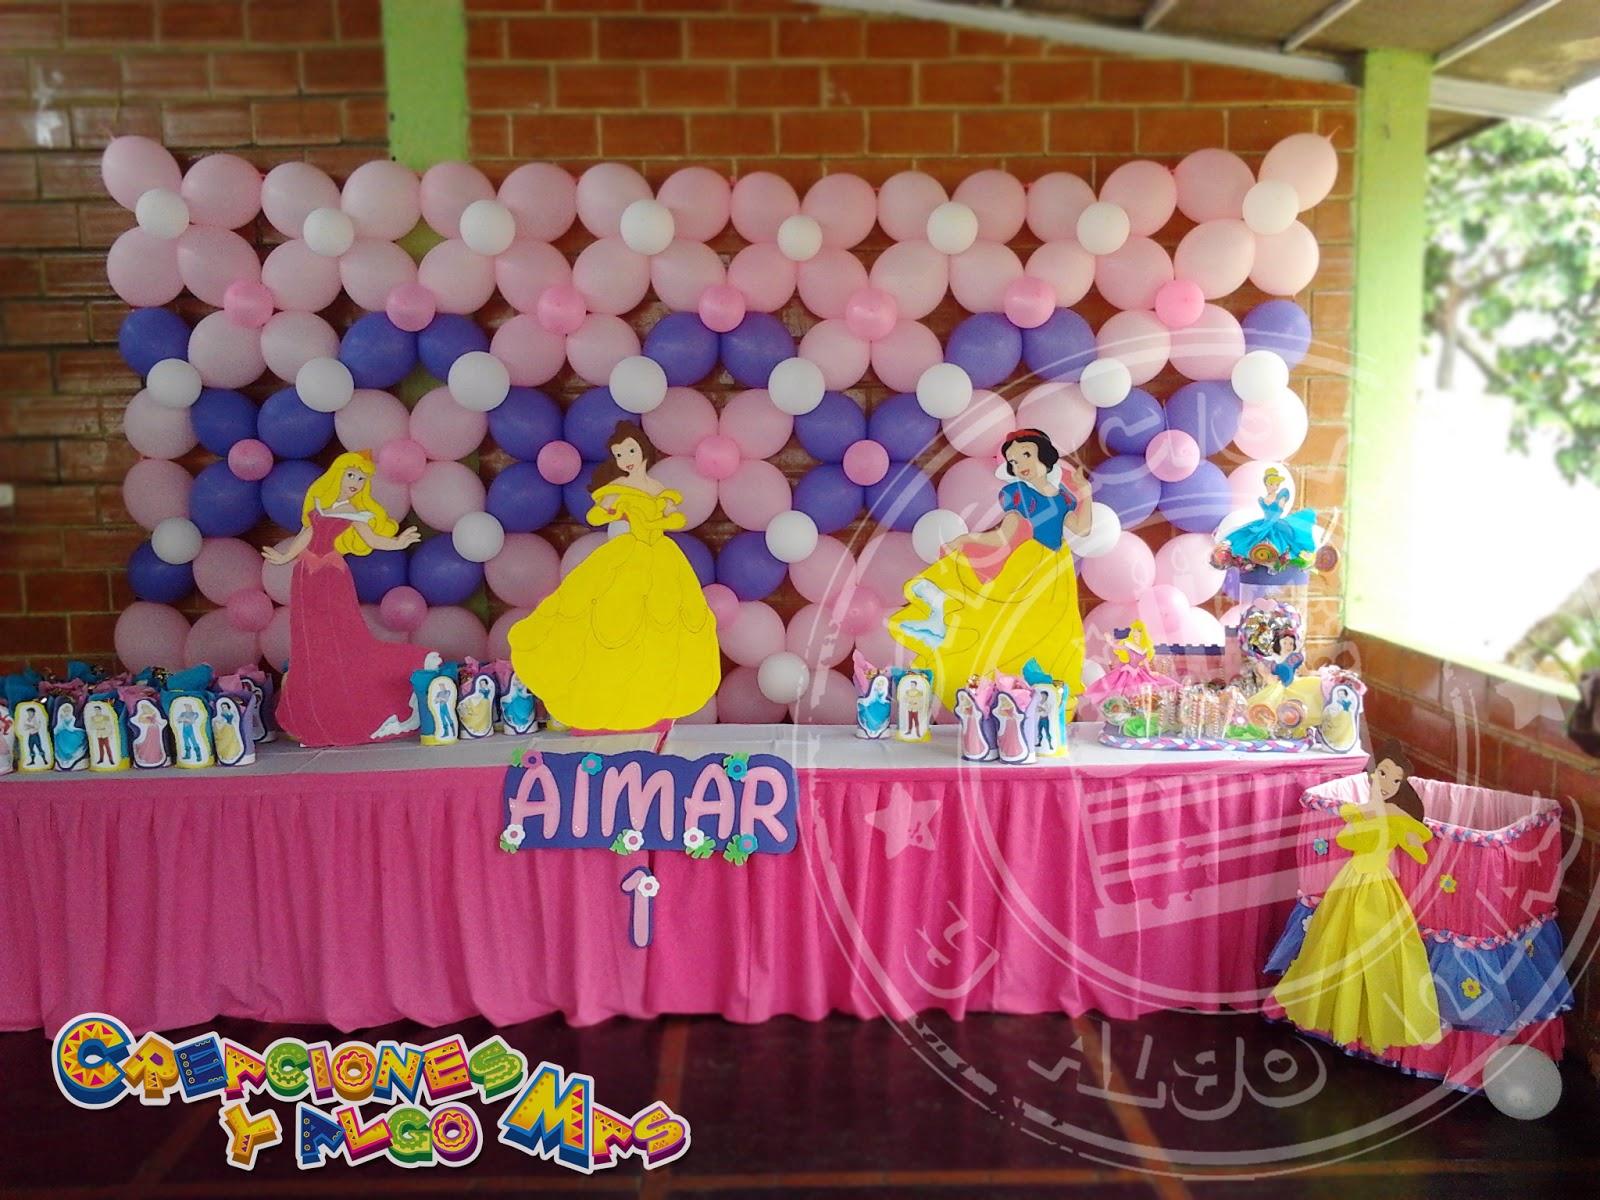 Fiesta motivo princesas disney disney princess party - Decoracion fiestas bebes ...